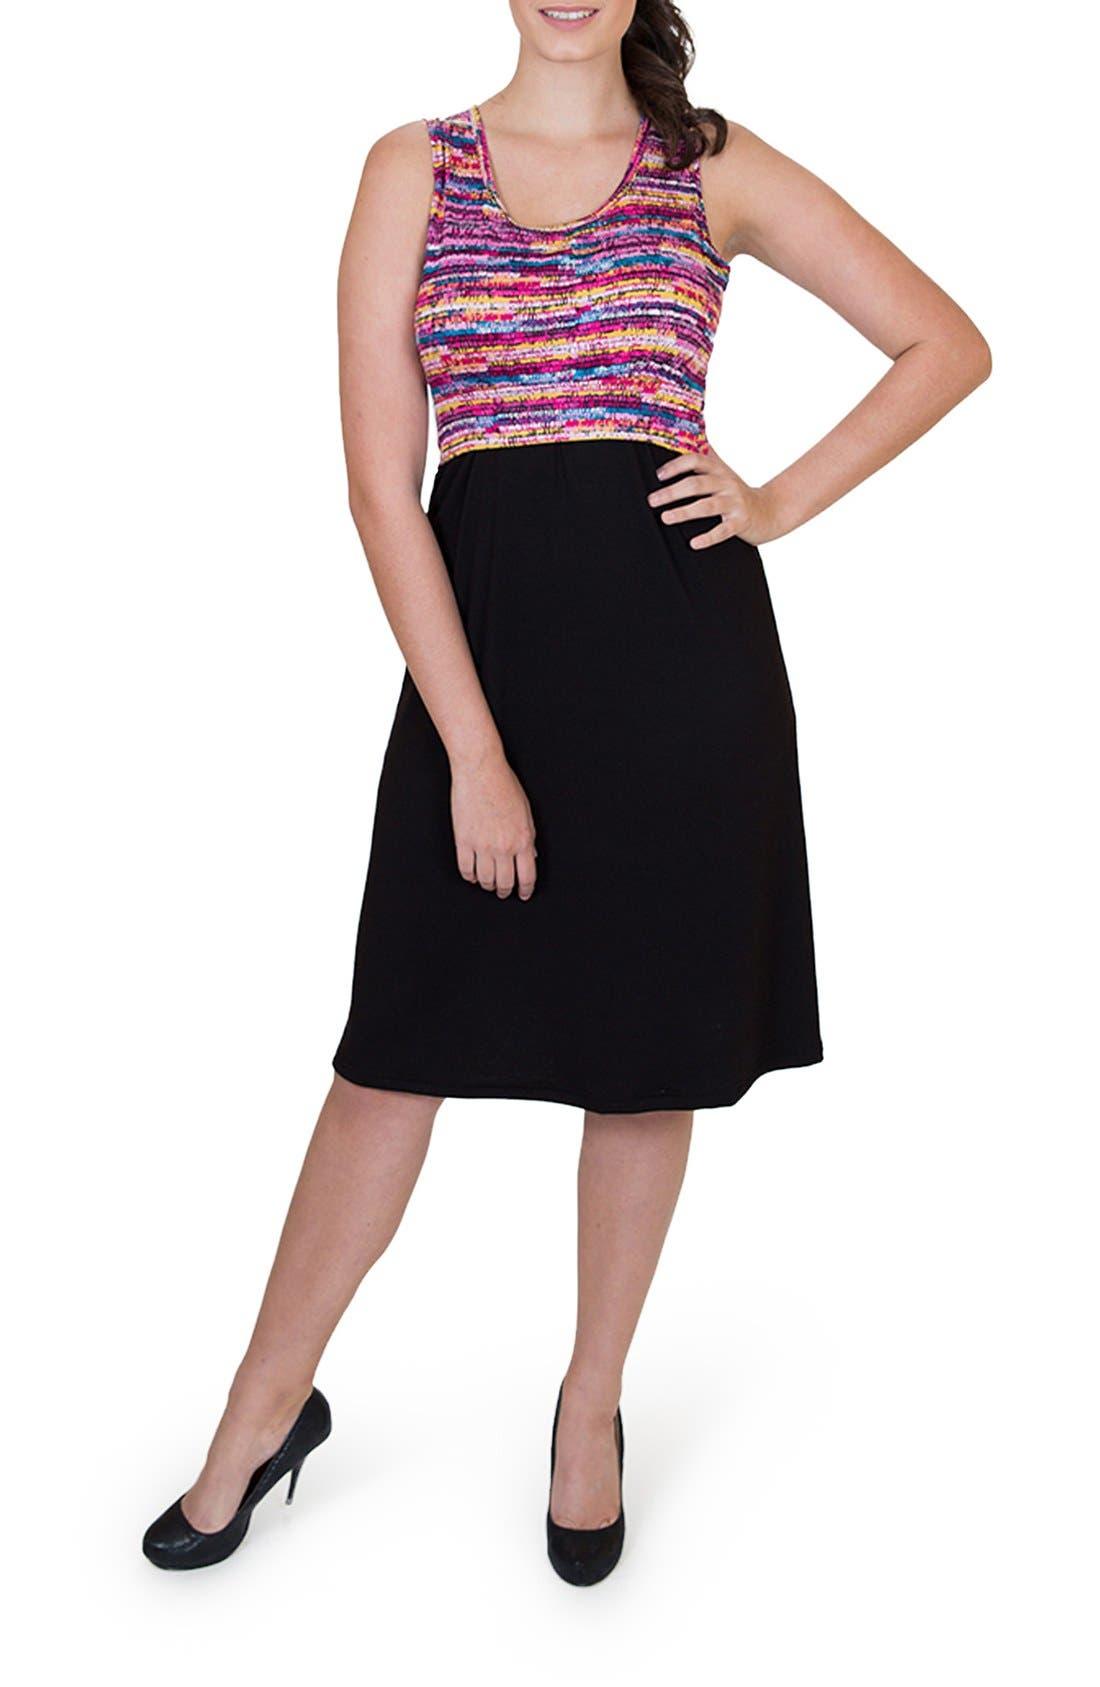 'Ana' Maternity/Nursing Dress,                             Main thumbnail 1, color,                             Colorful Top W/ Black Skirt